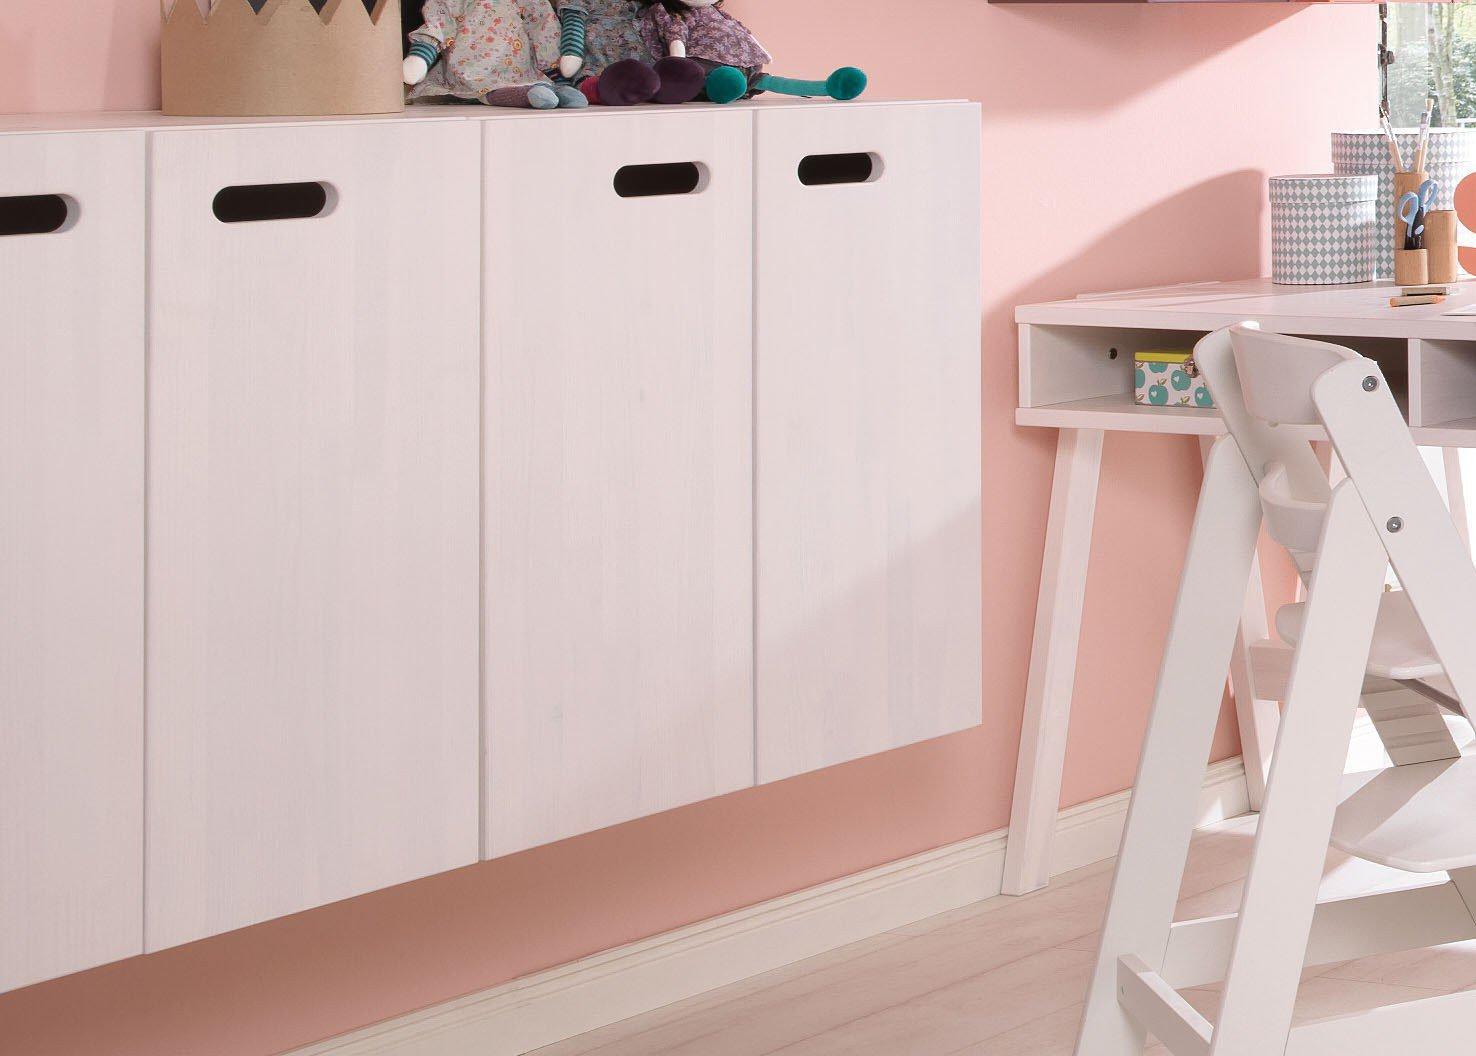 beste welle m bel lumio galerie die besten wohnideen. Black Bedroom Furniture Sets. Home Design Ideas